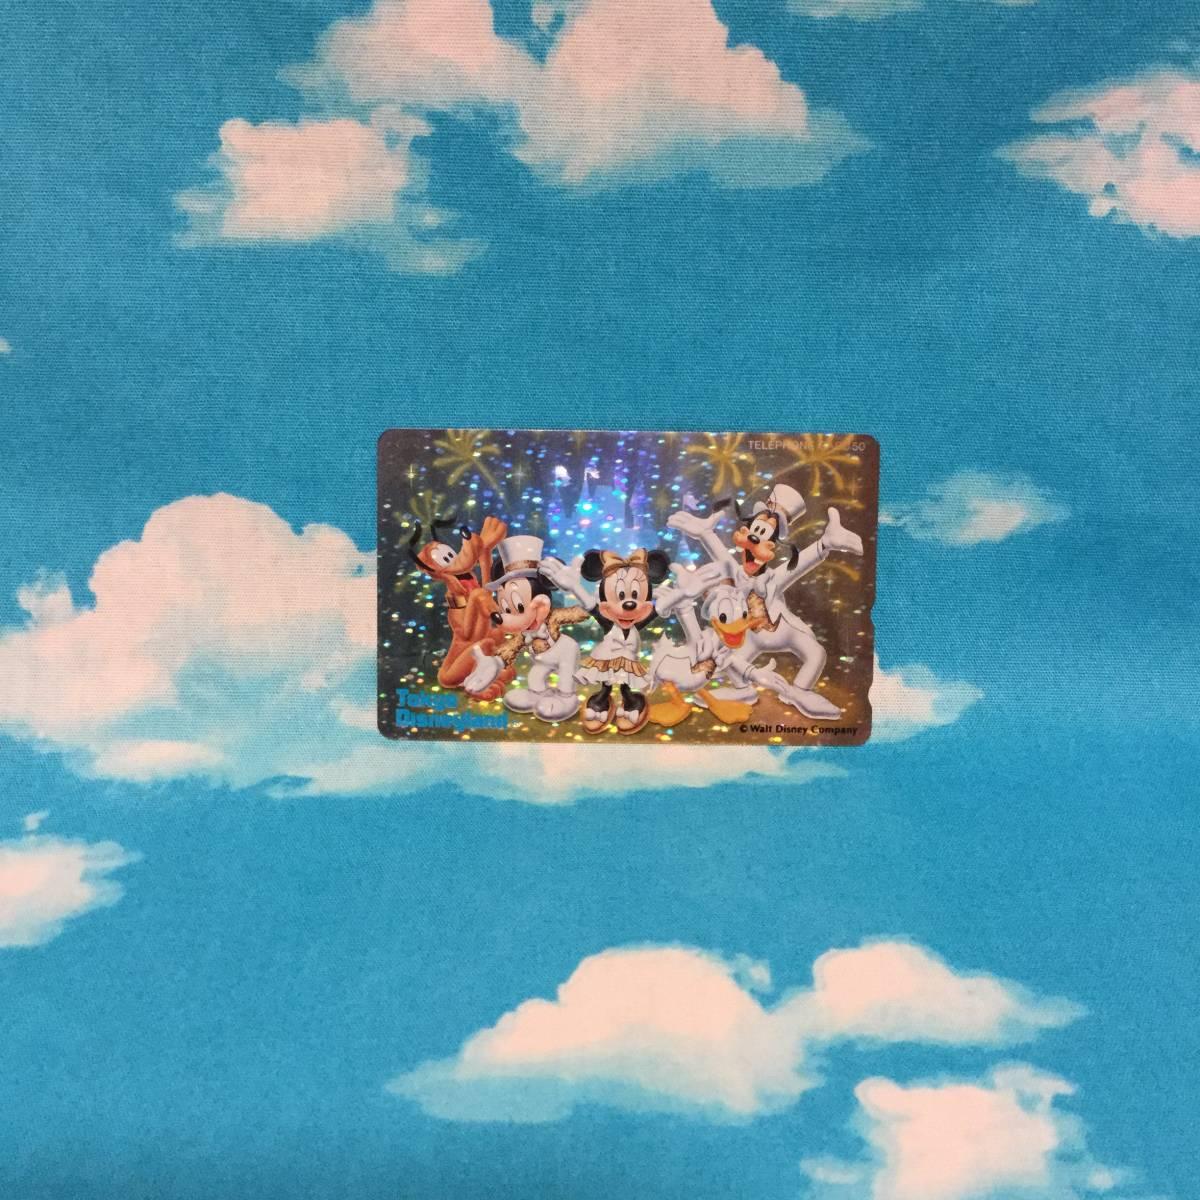 ■Disney東京ディズニーランドホログラムテレカ■50度未使用■プルートミッキーマウスミニーマウスドナルドダックグーフィーテレホンカード_画像1